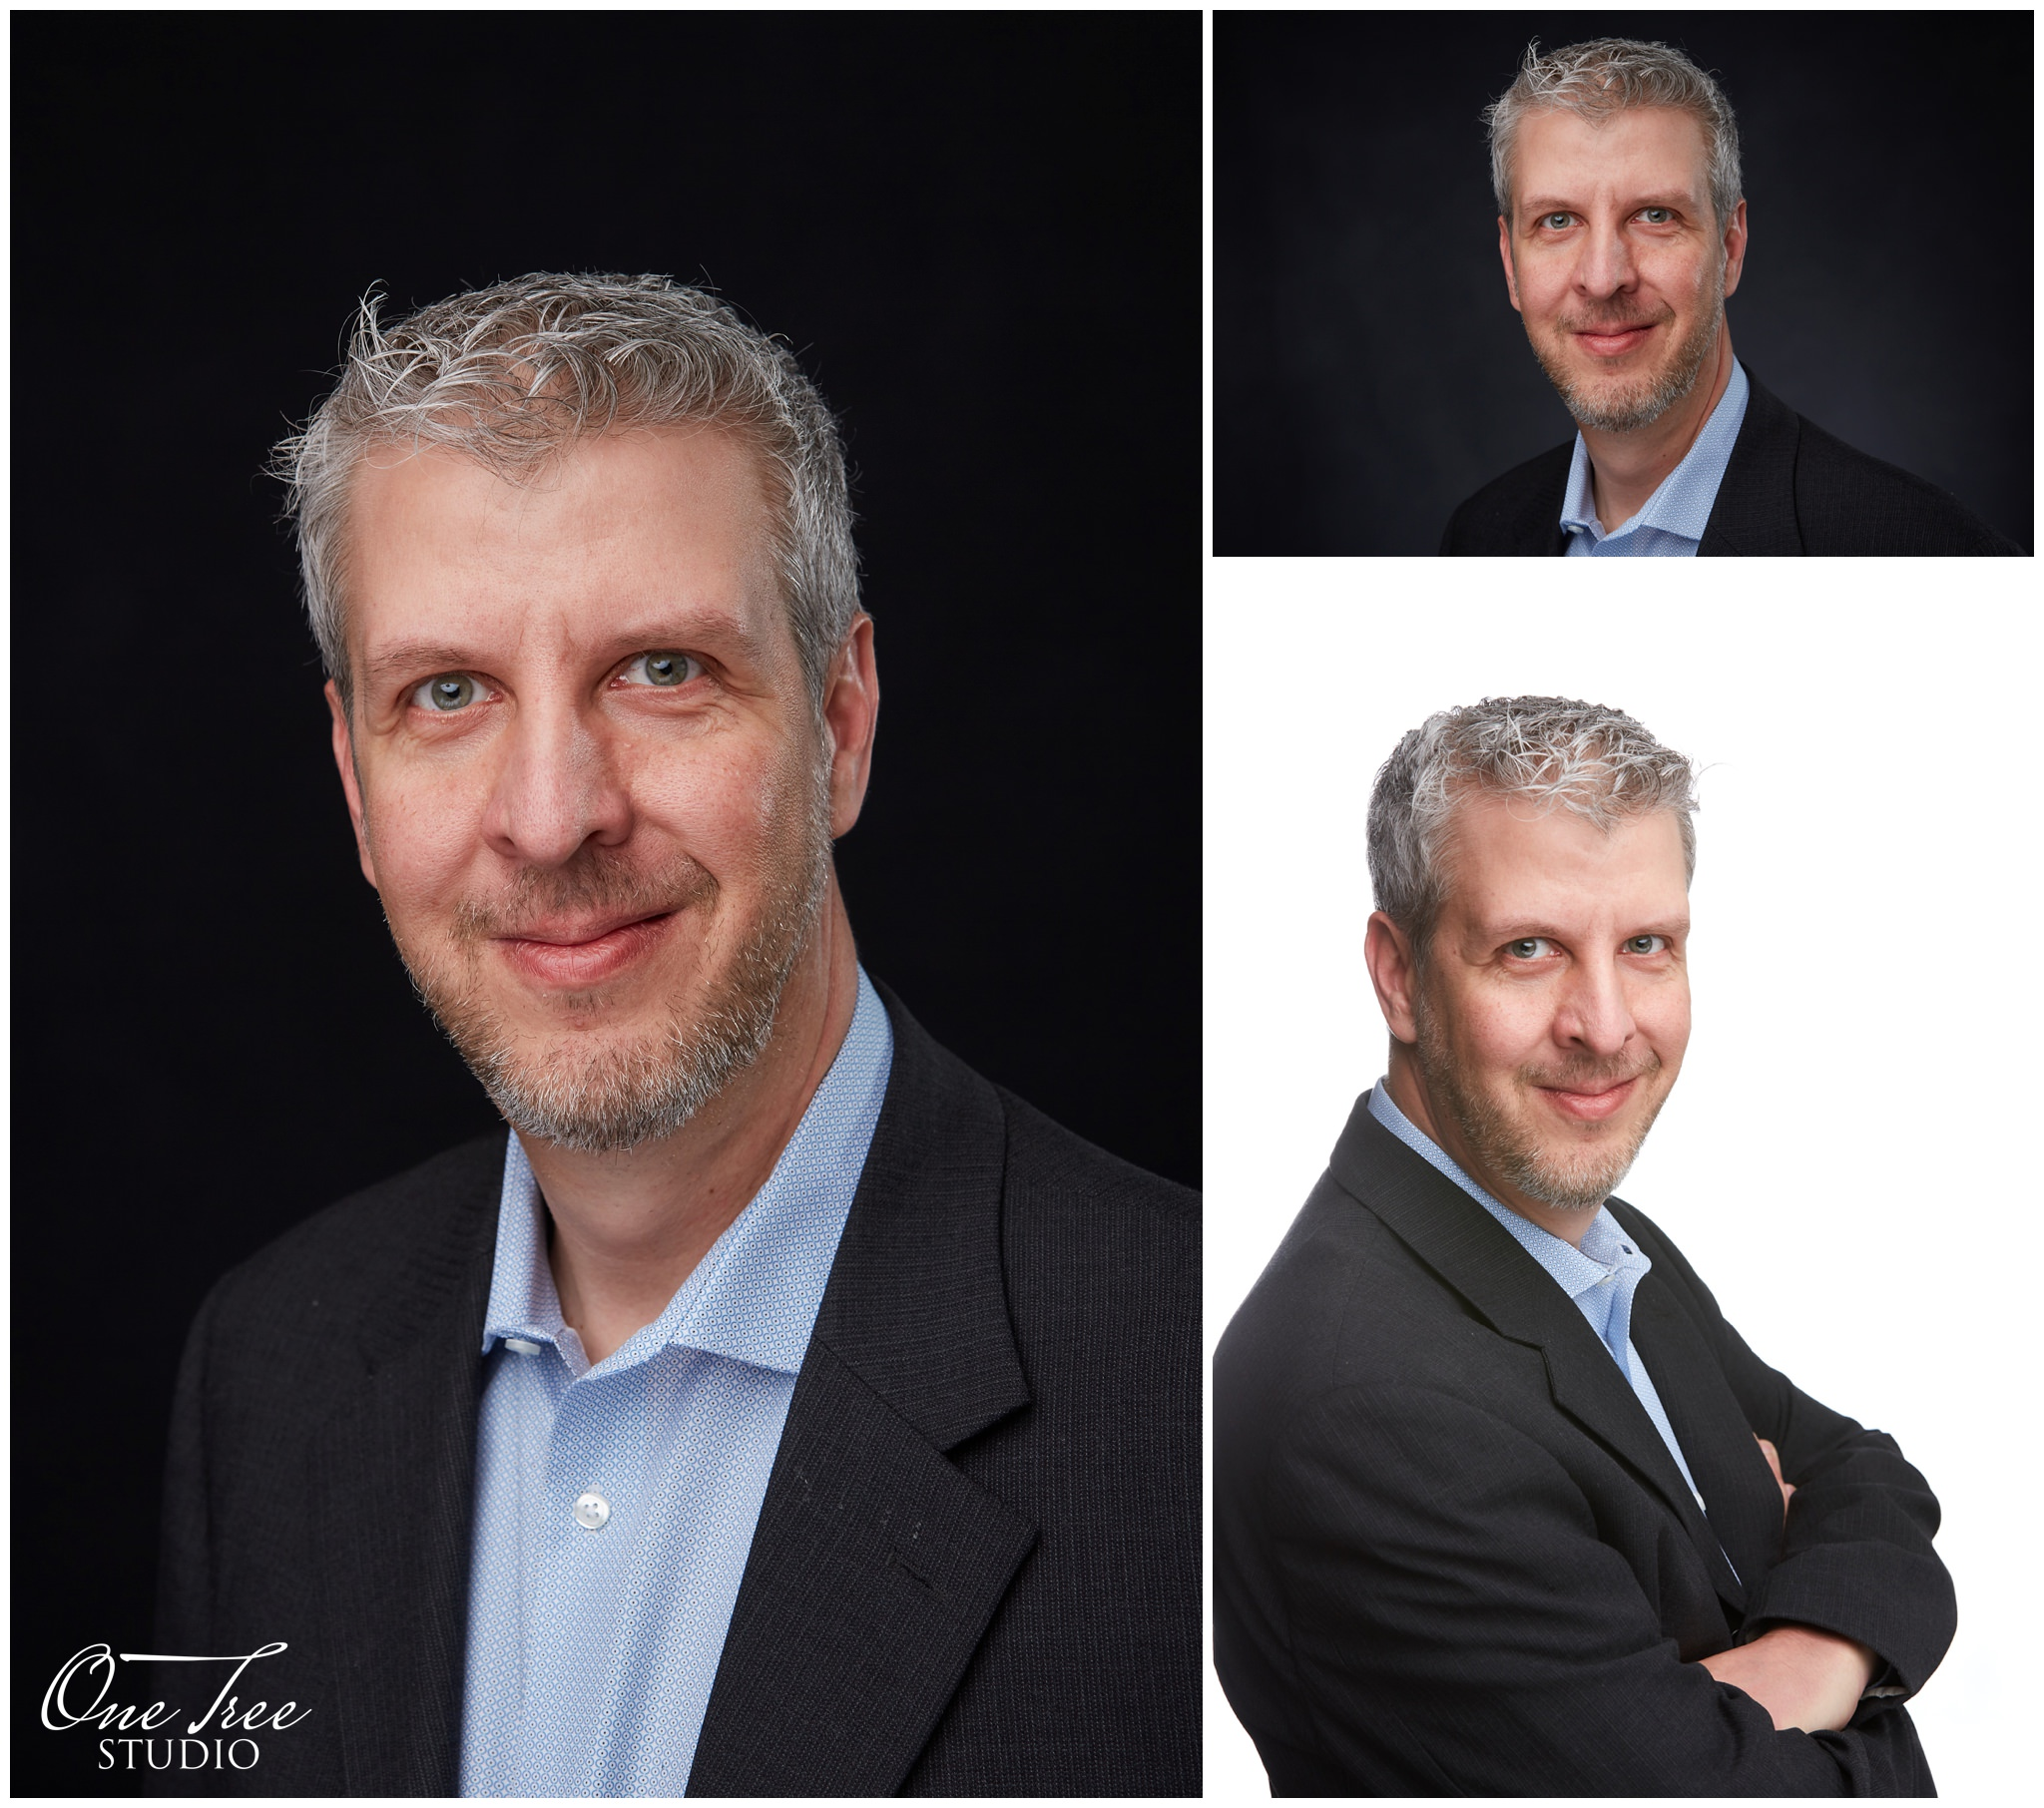 High Volume Executive Headshots | Rogers Communications | One Tree Studio Inc. | Metro Toronto Convention Centre